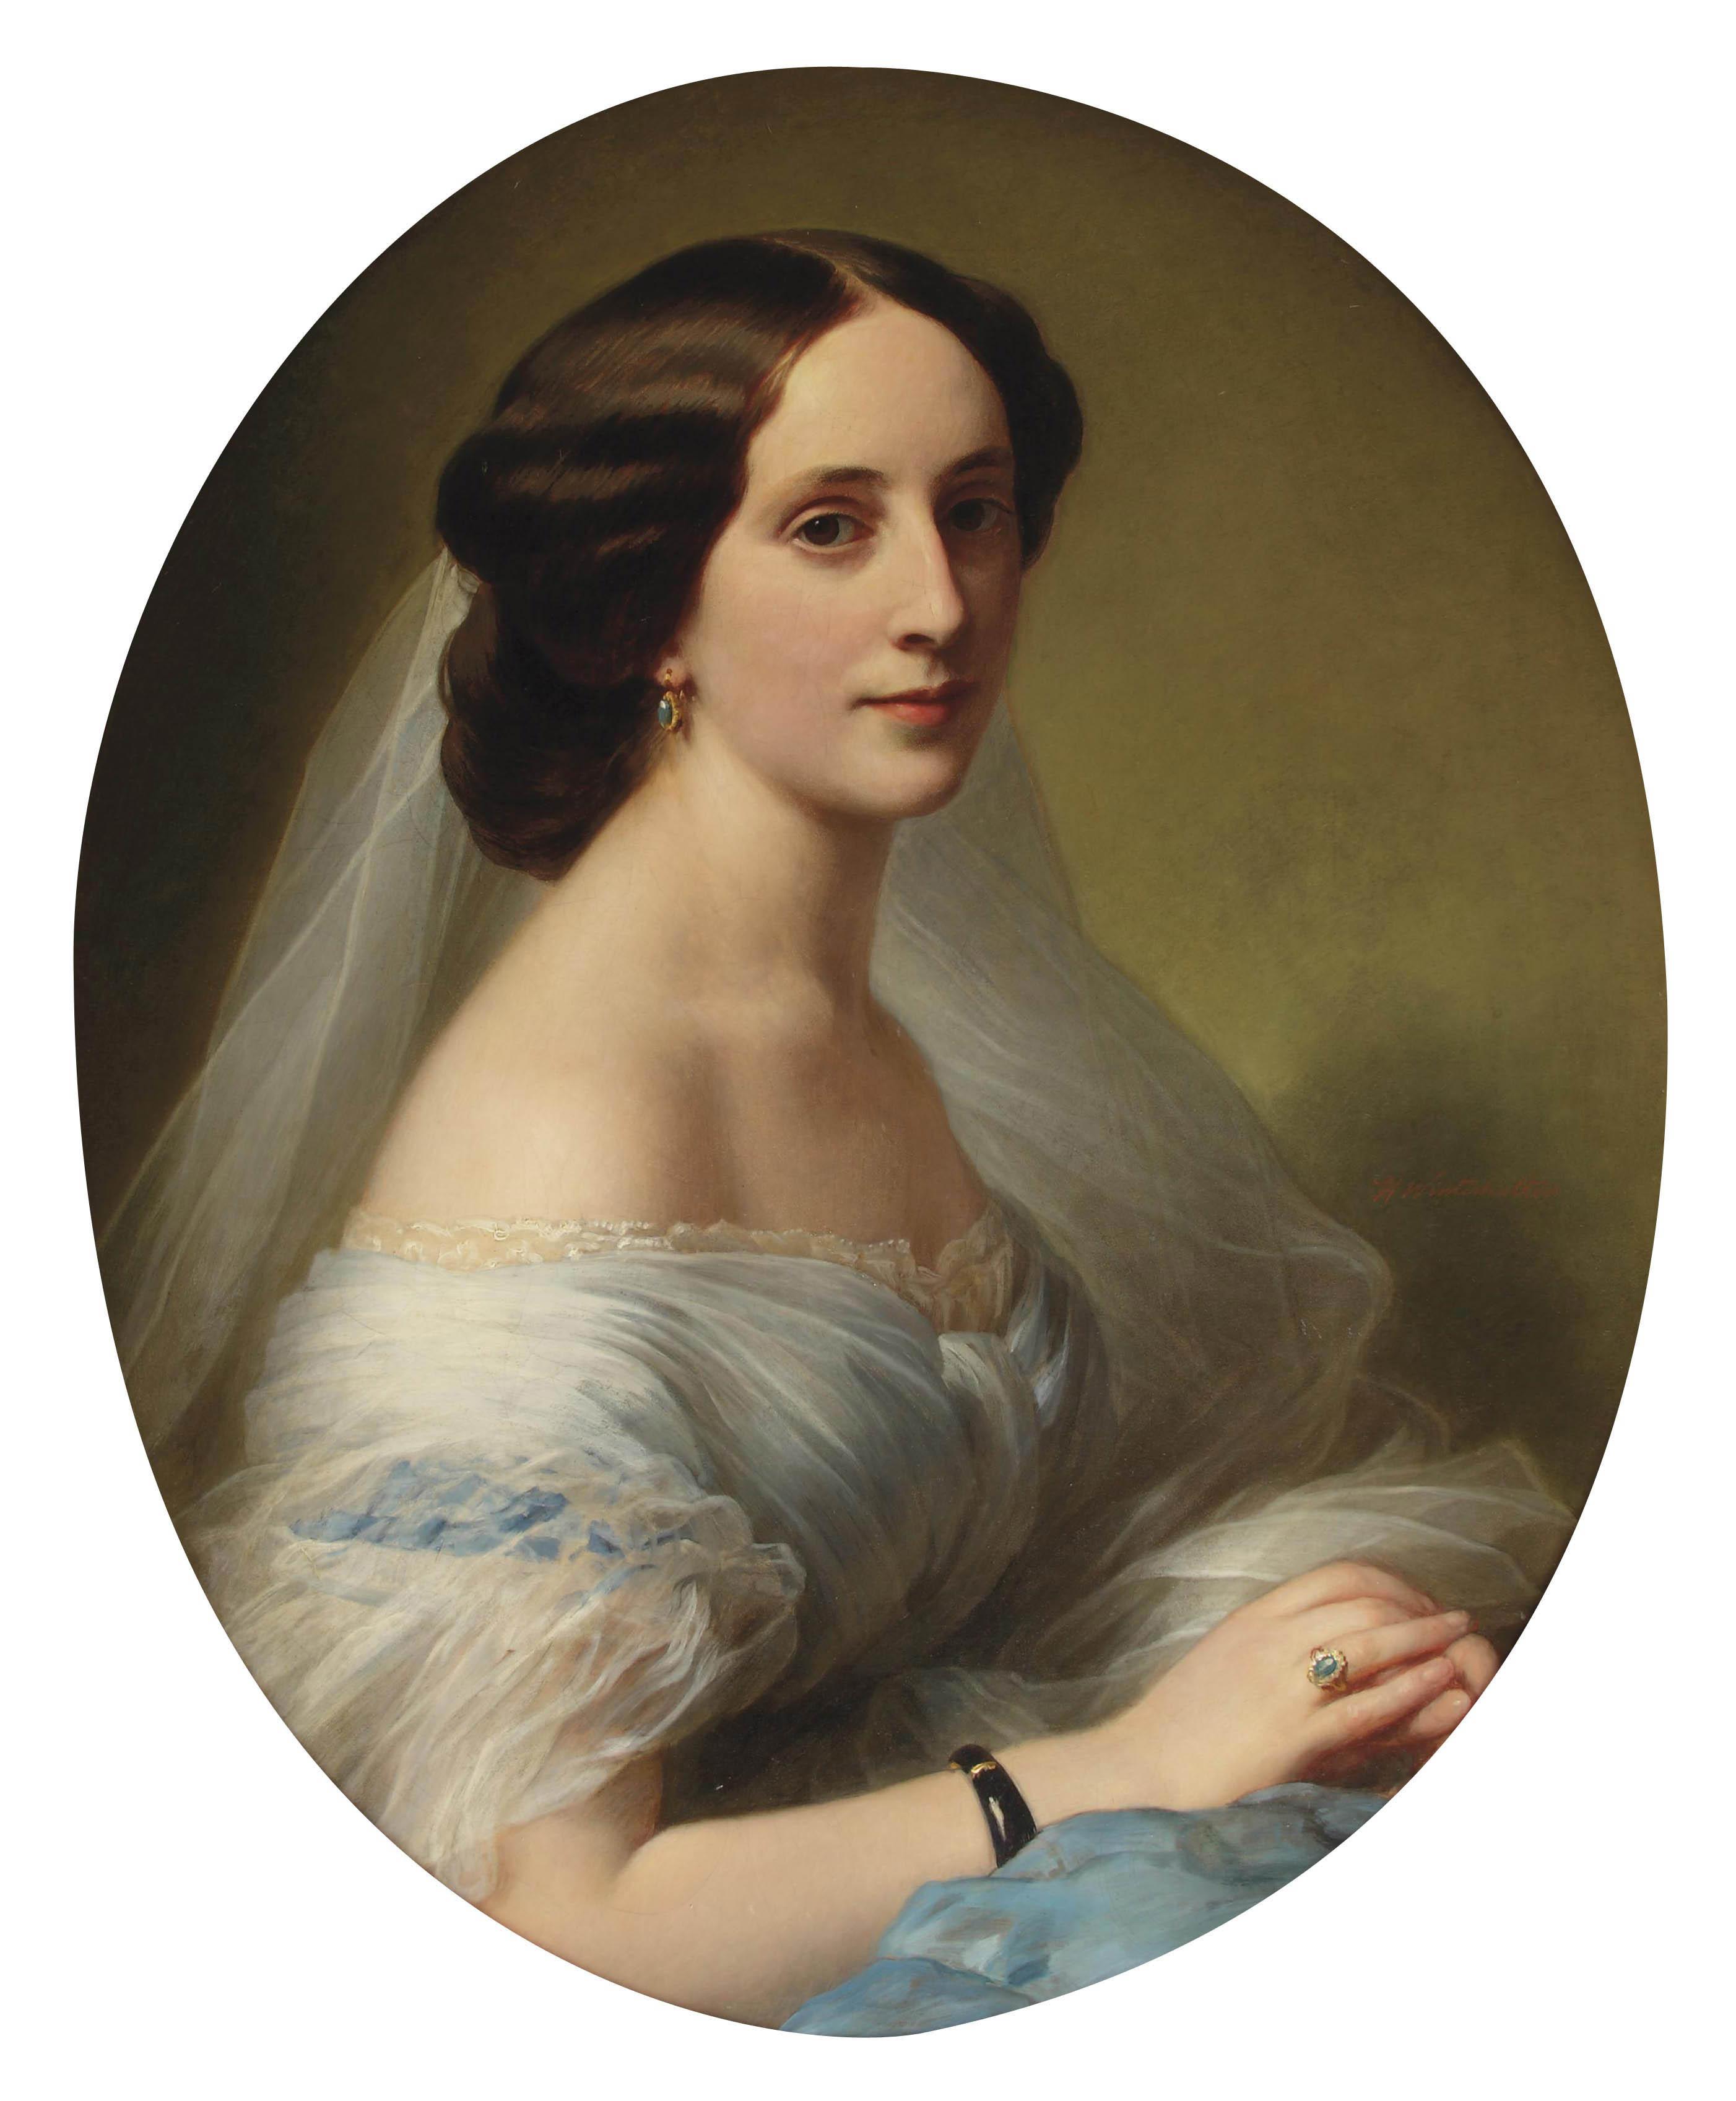 Hermann Winterhalter (Saint Blasien 1808-1891 Karlsruhe)